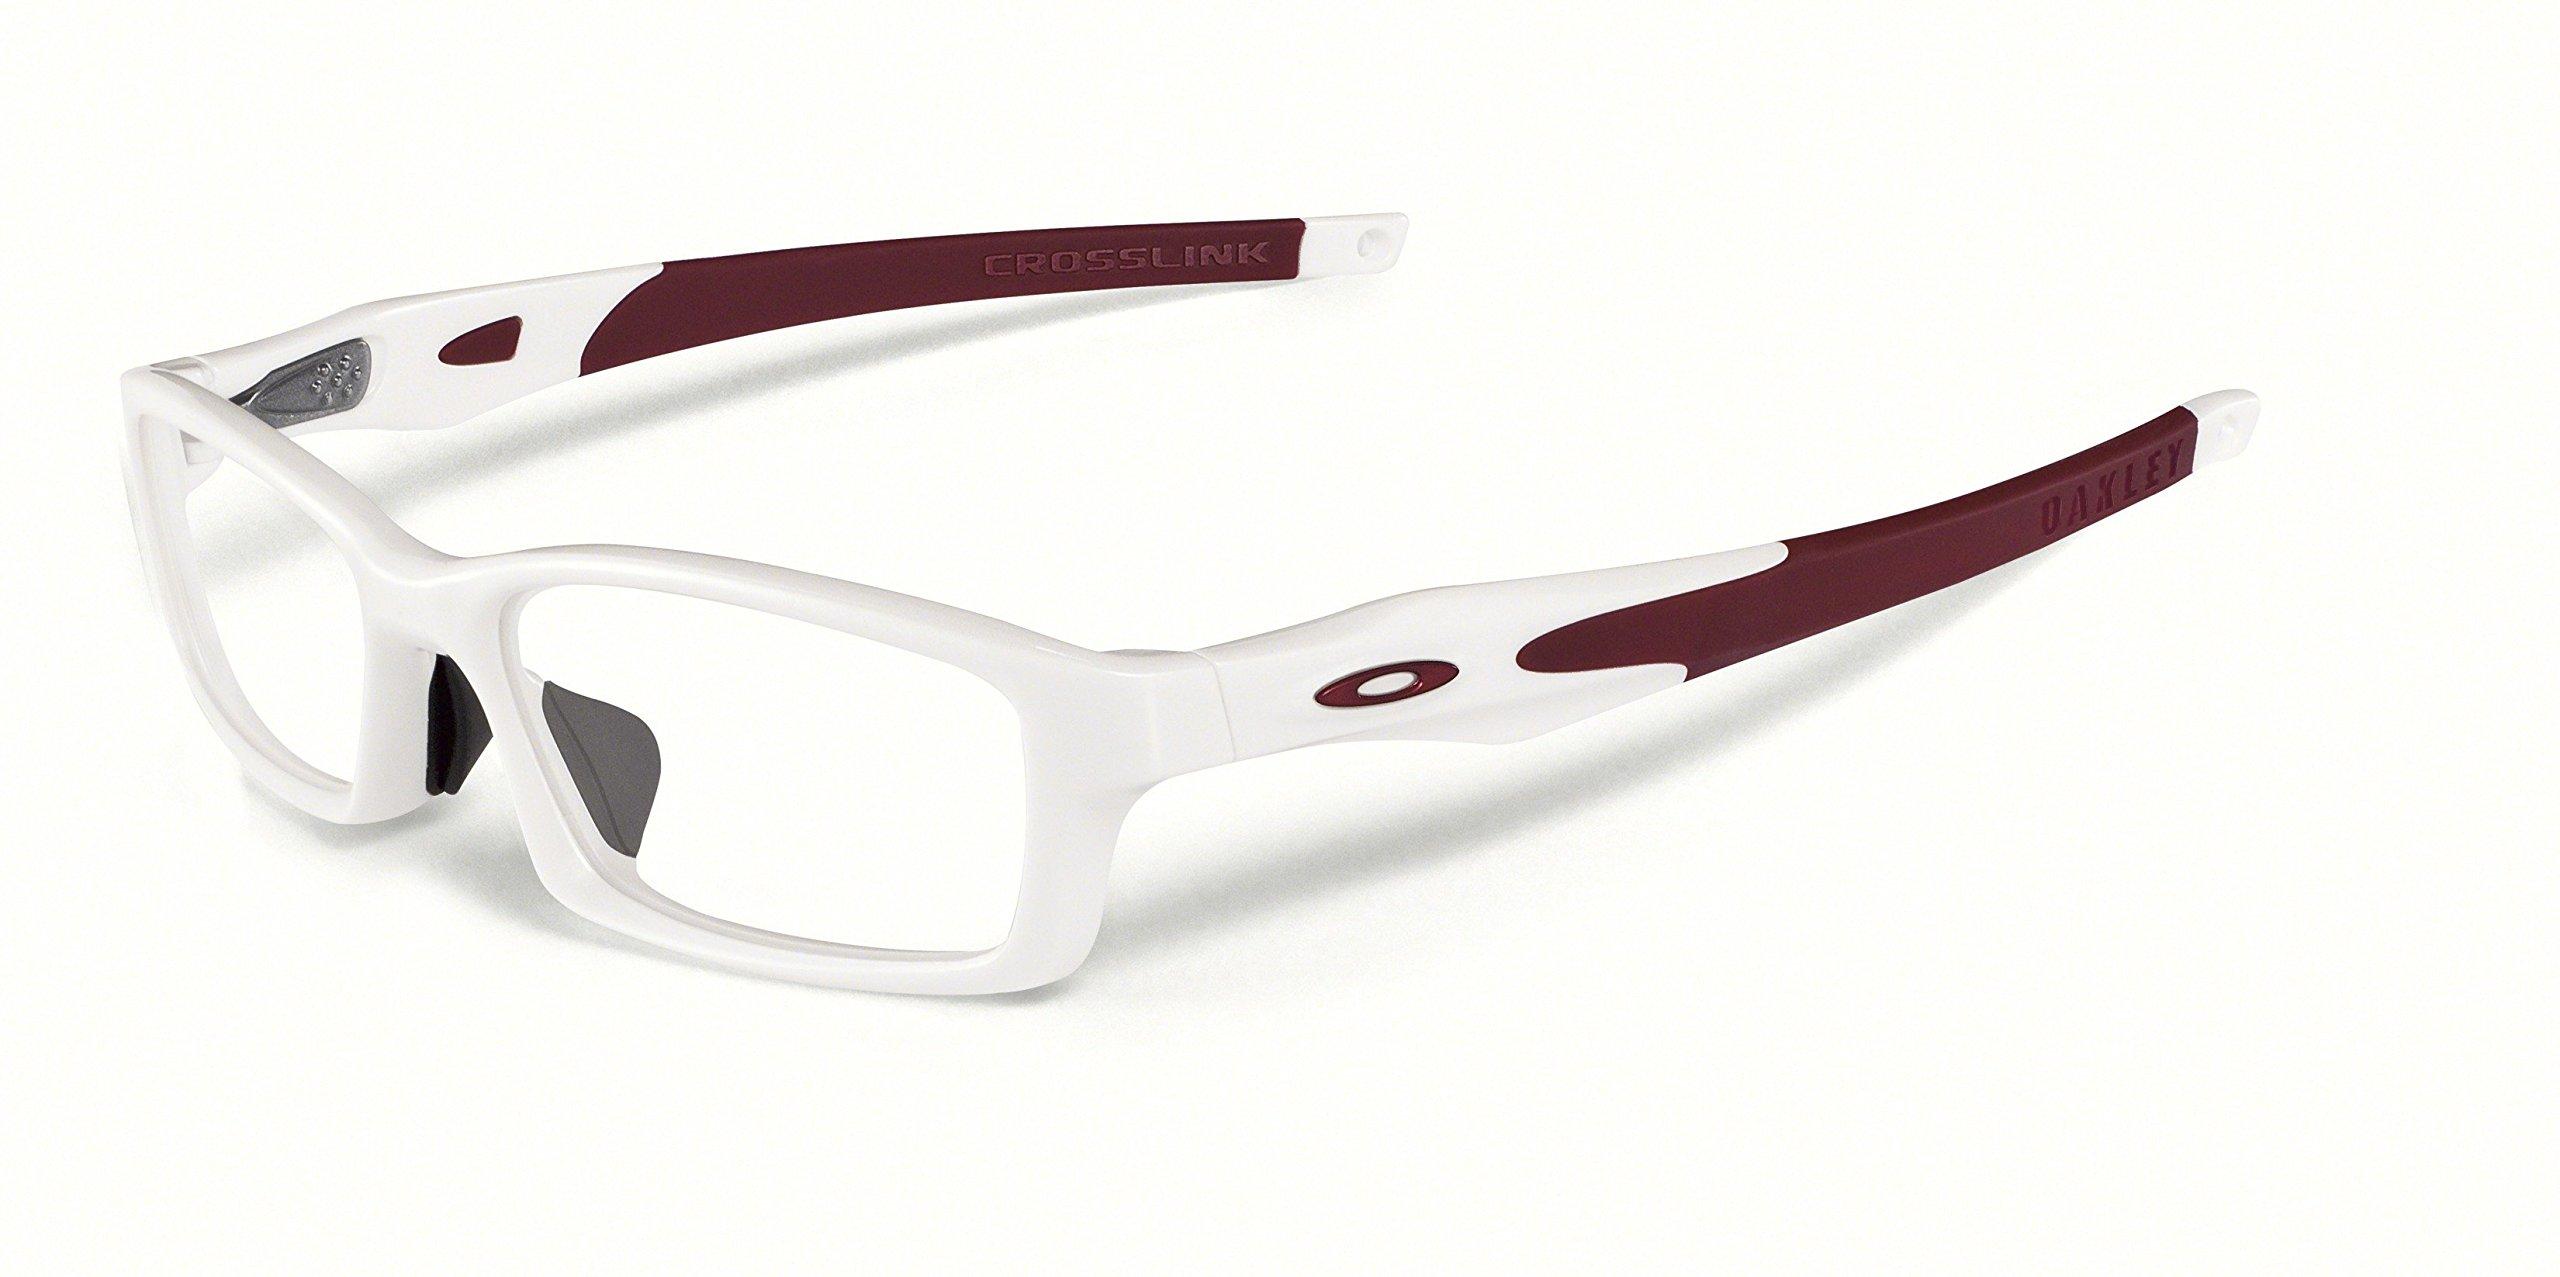 New Oakley Prescription Eyeglasses - Crosslink A OX8029 04 - Pearl/Tim Cardinal (56-17-140)